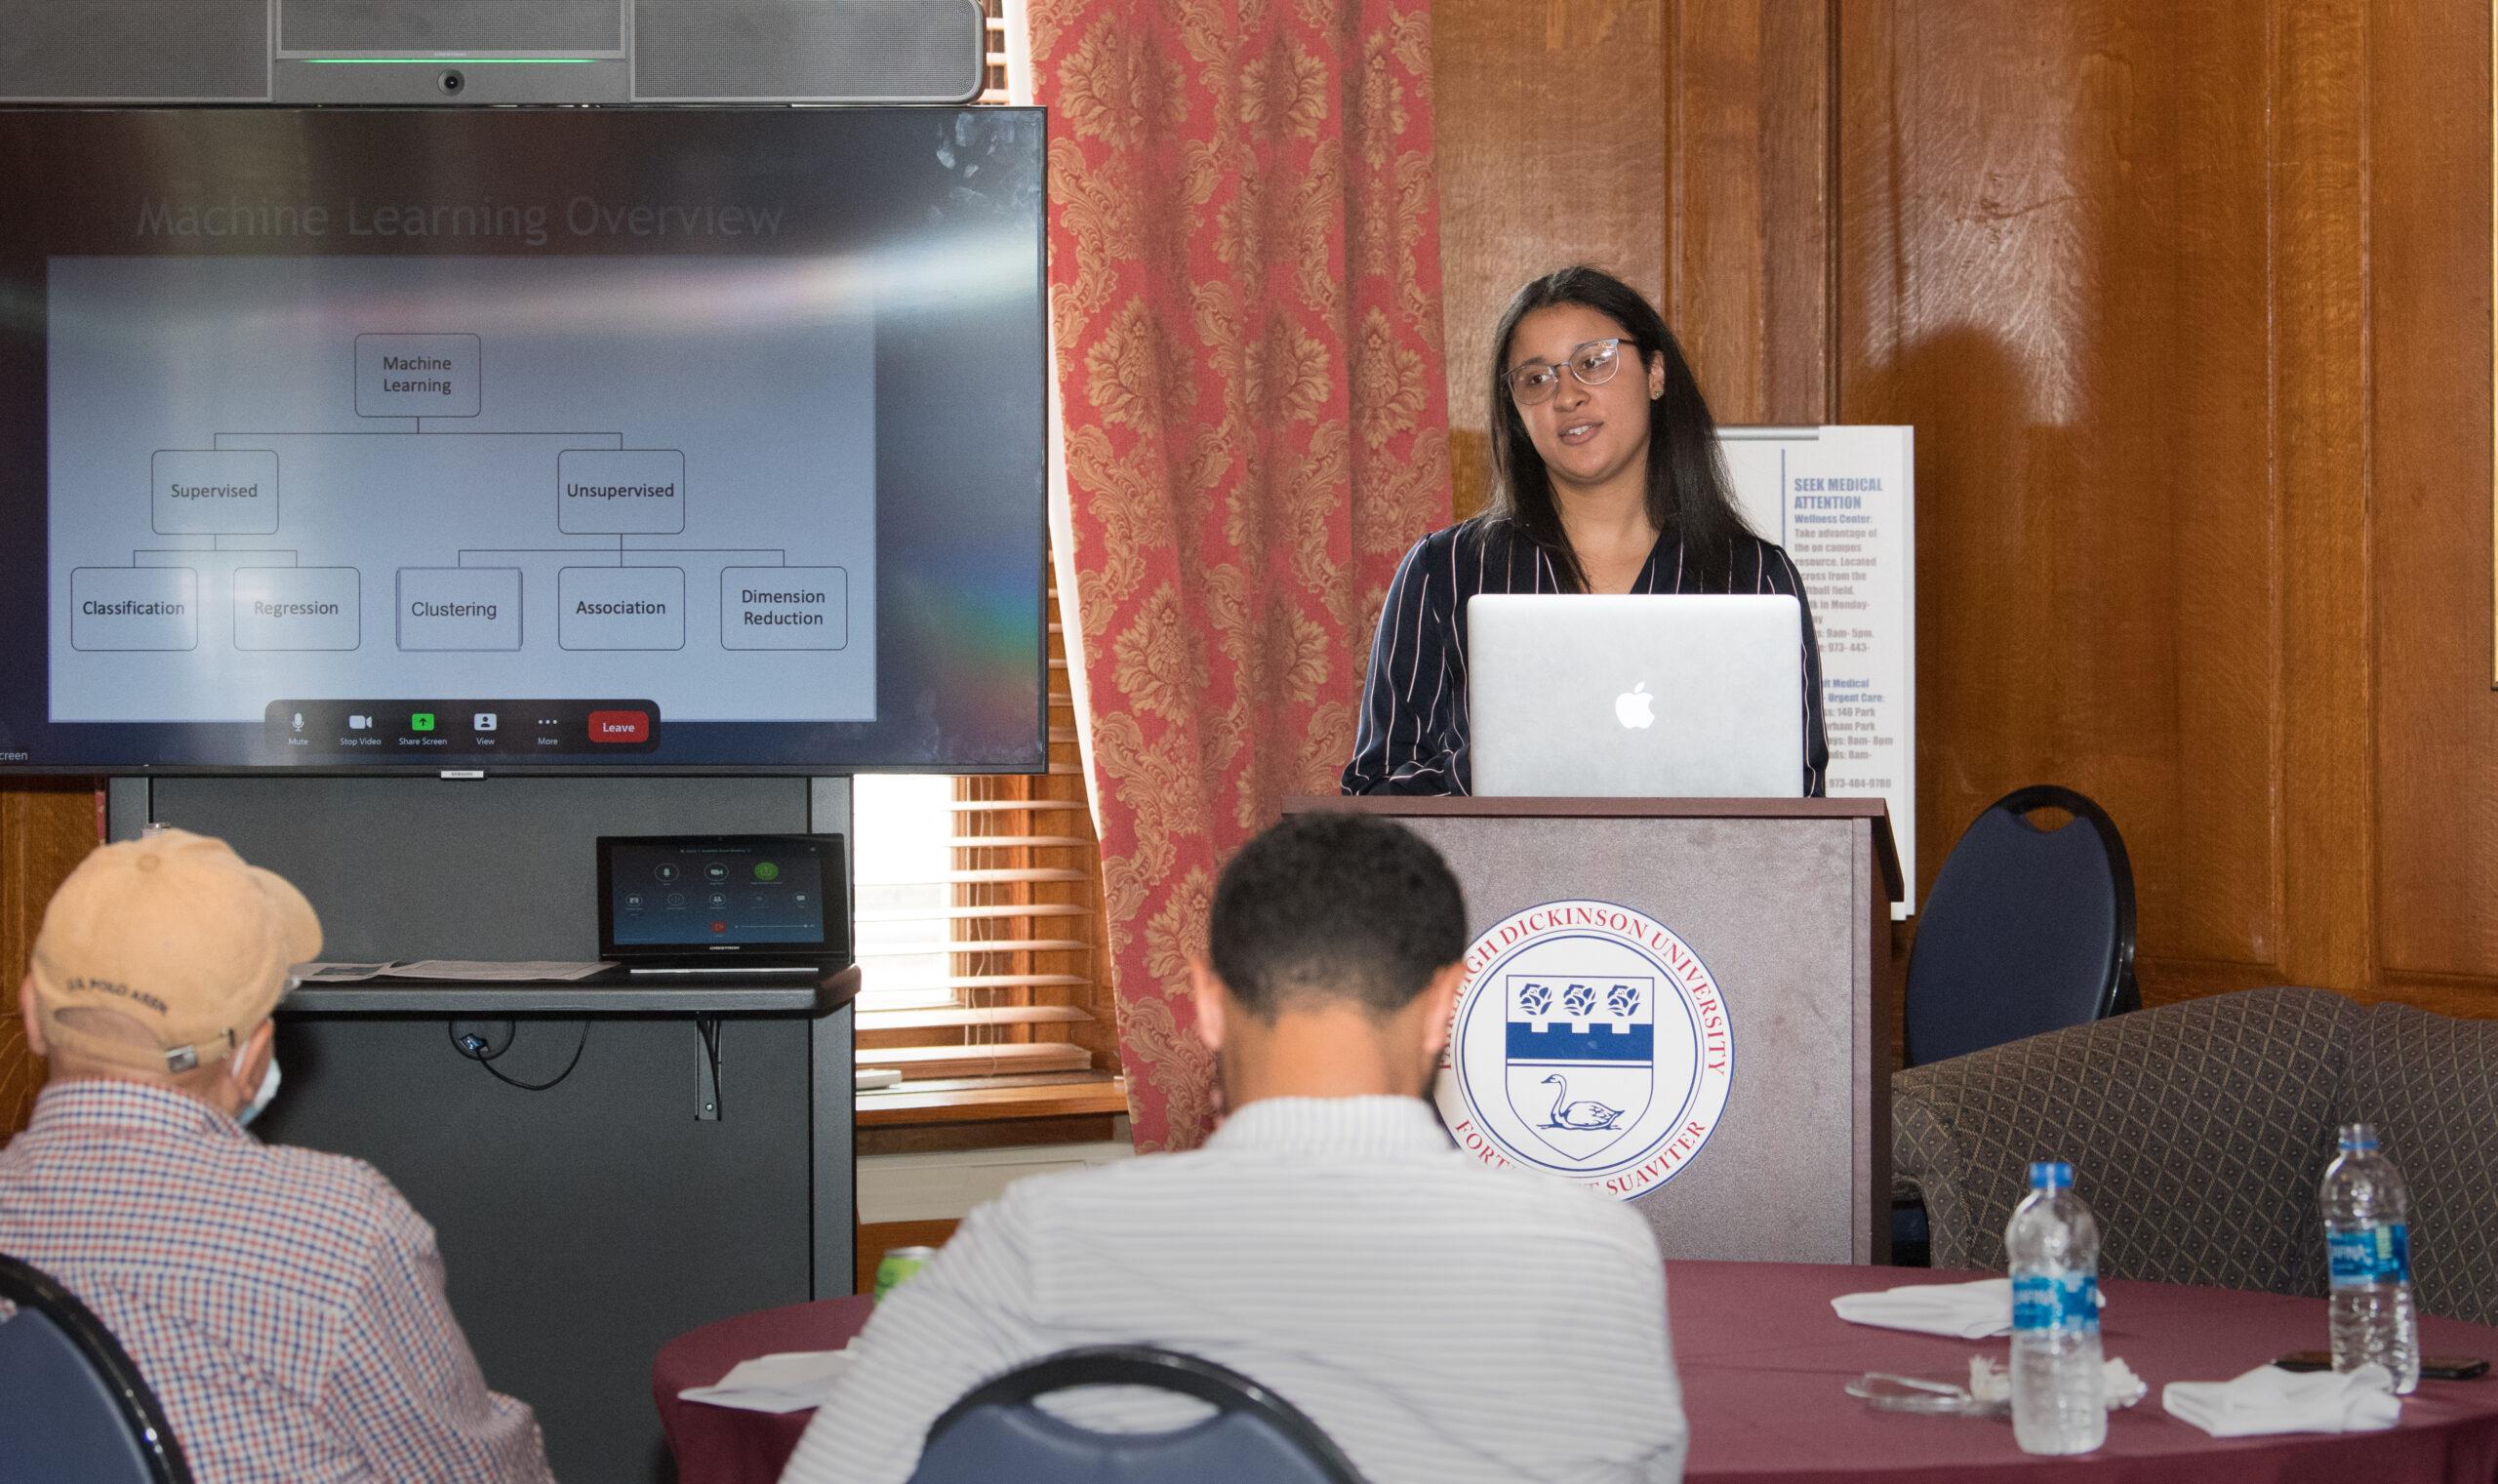 A student speak at a podium.